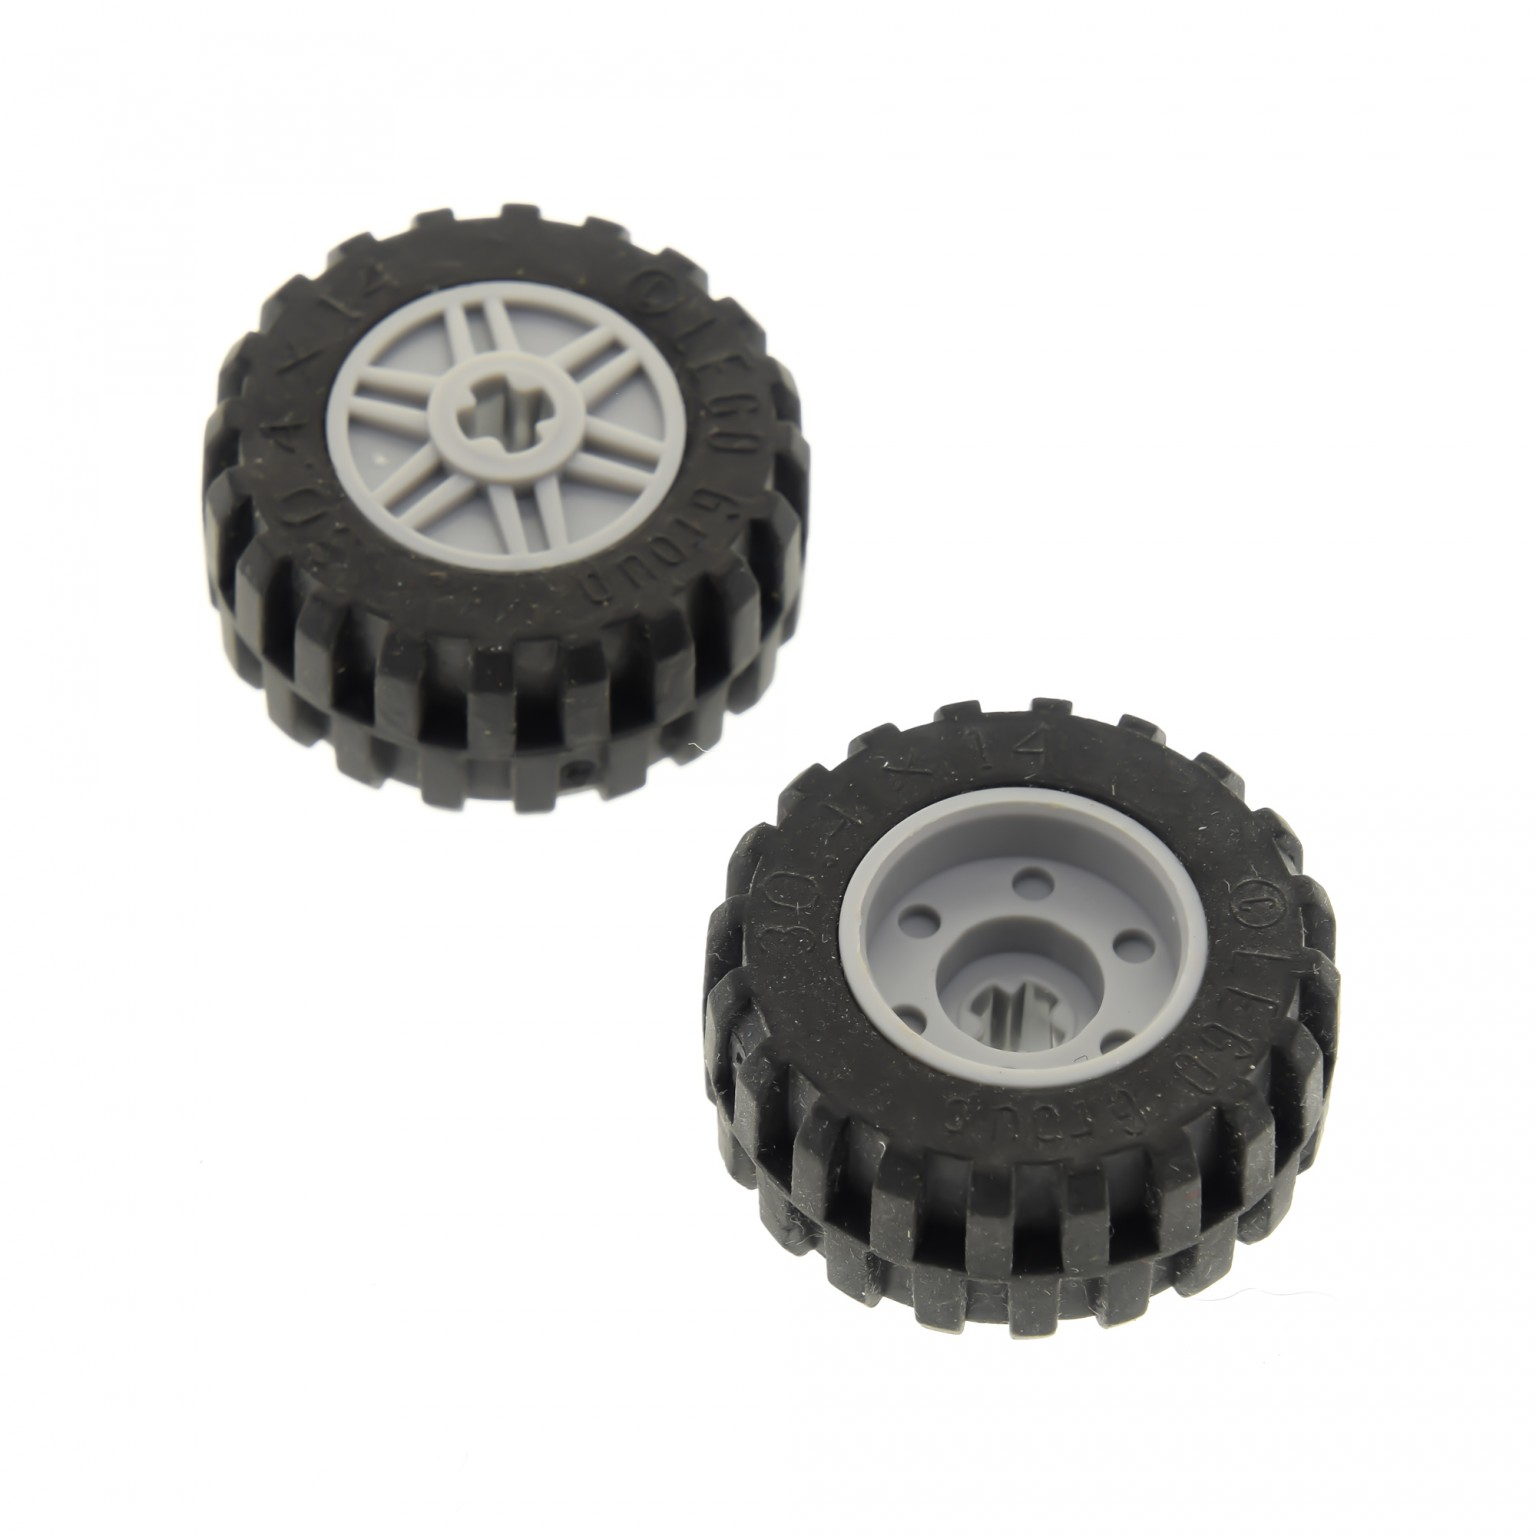 2x Lego Rad neu-hell grau 18x14 Auto 30.4x14 4619323 4490127 55982c05